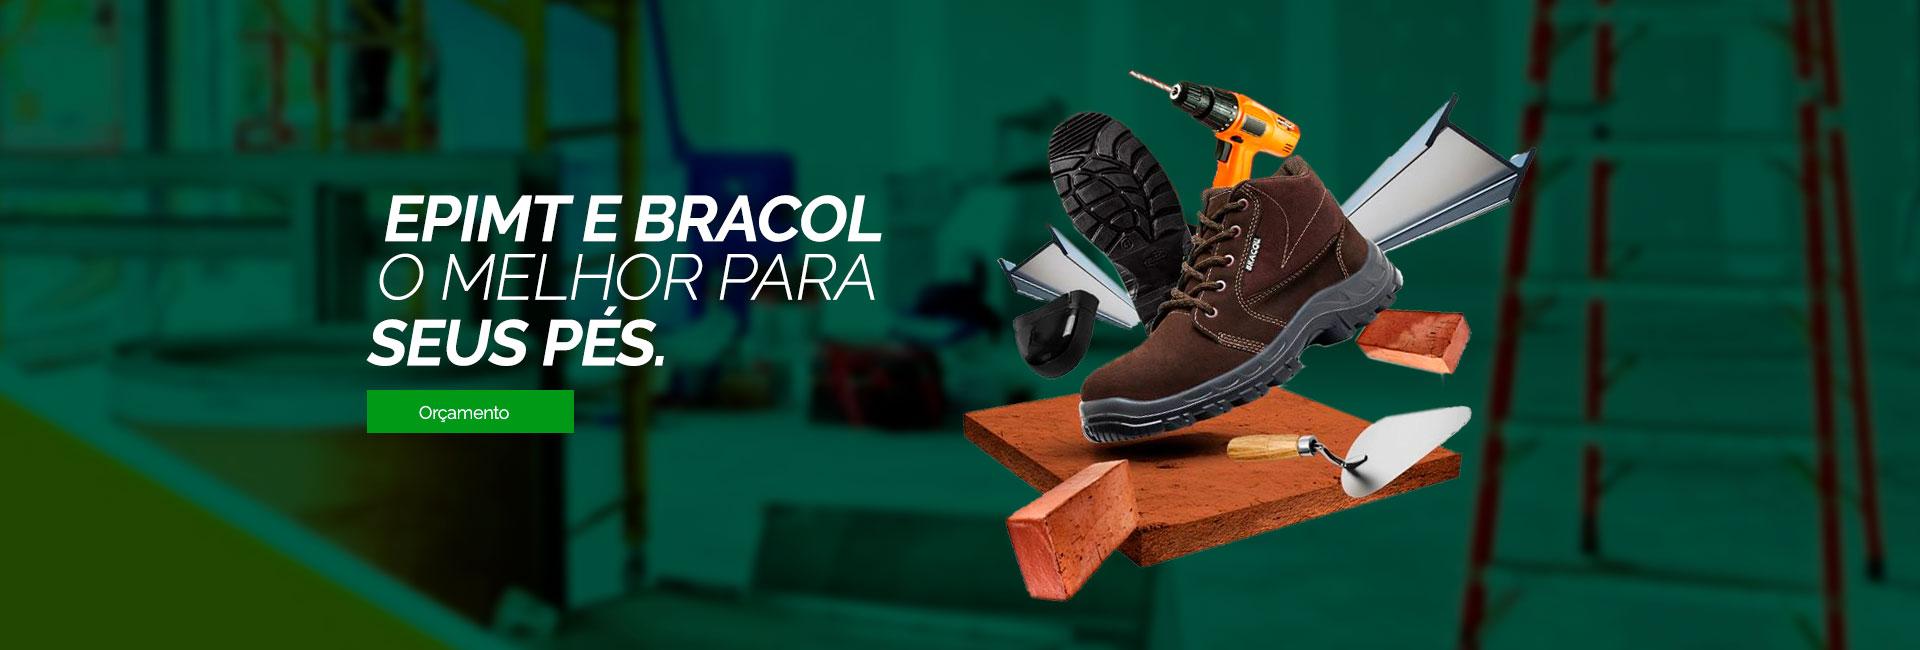 9cba6072d9b51 Epi MT - Equipamentos de Proteção Individual - EPIs Rondonópolis